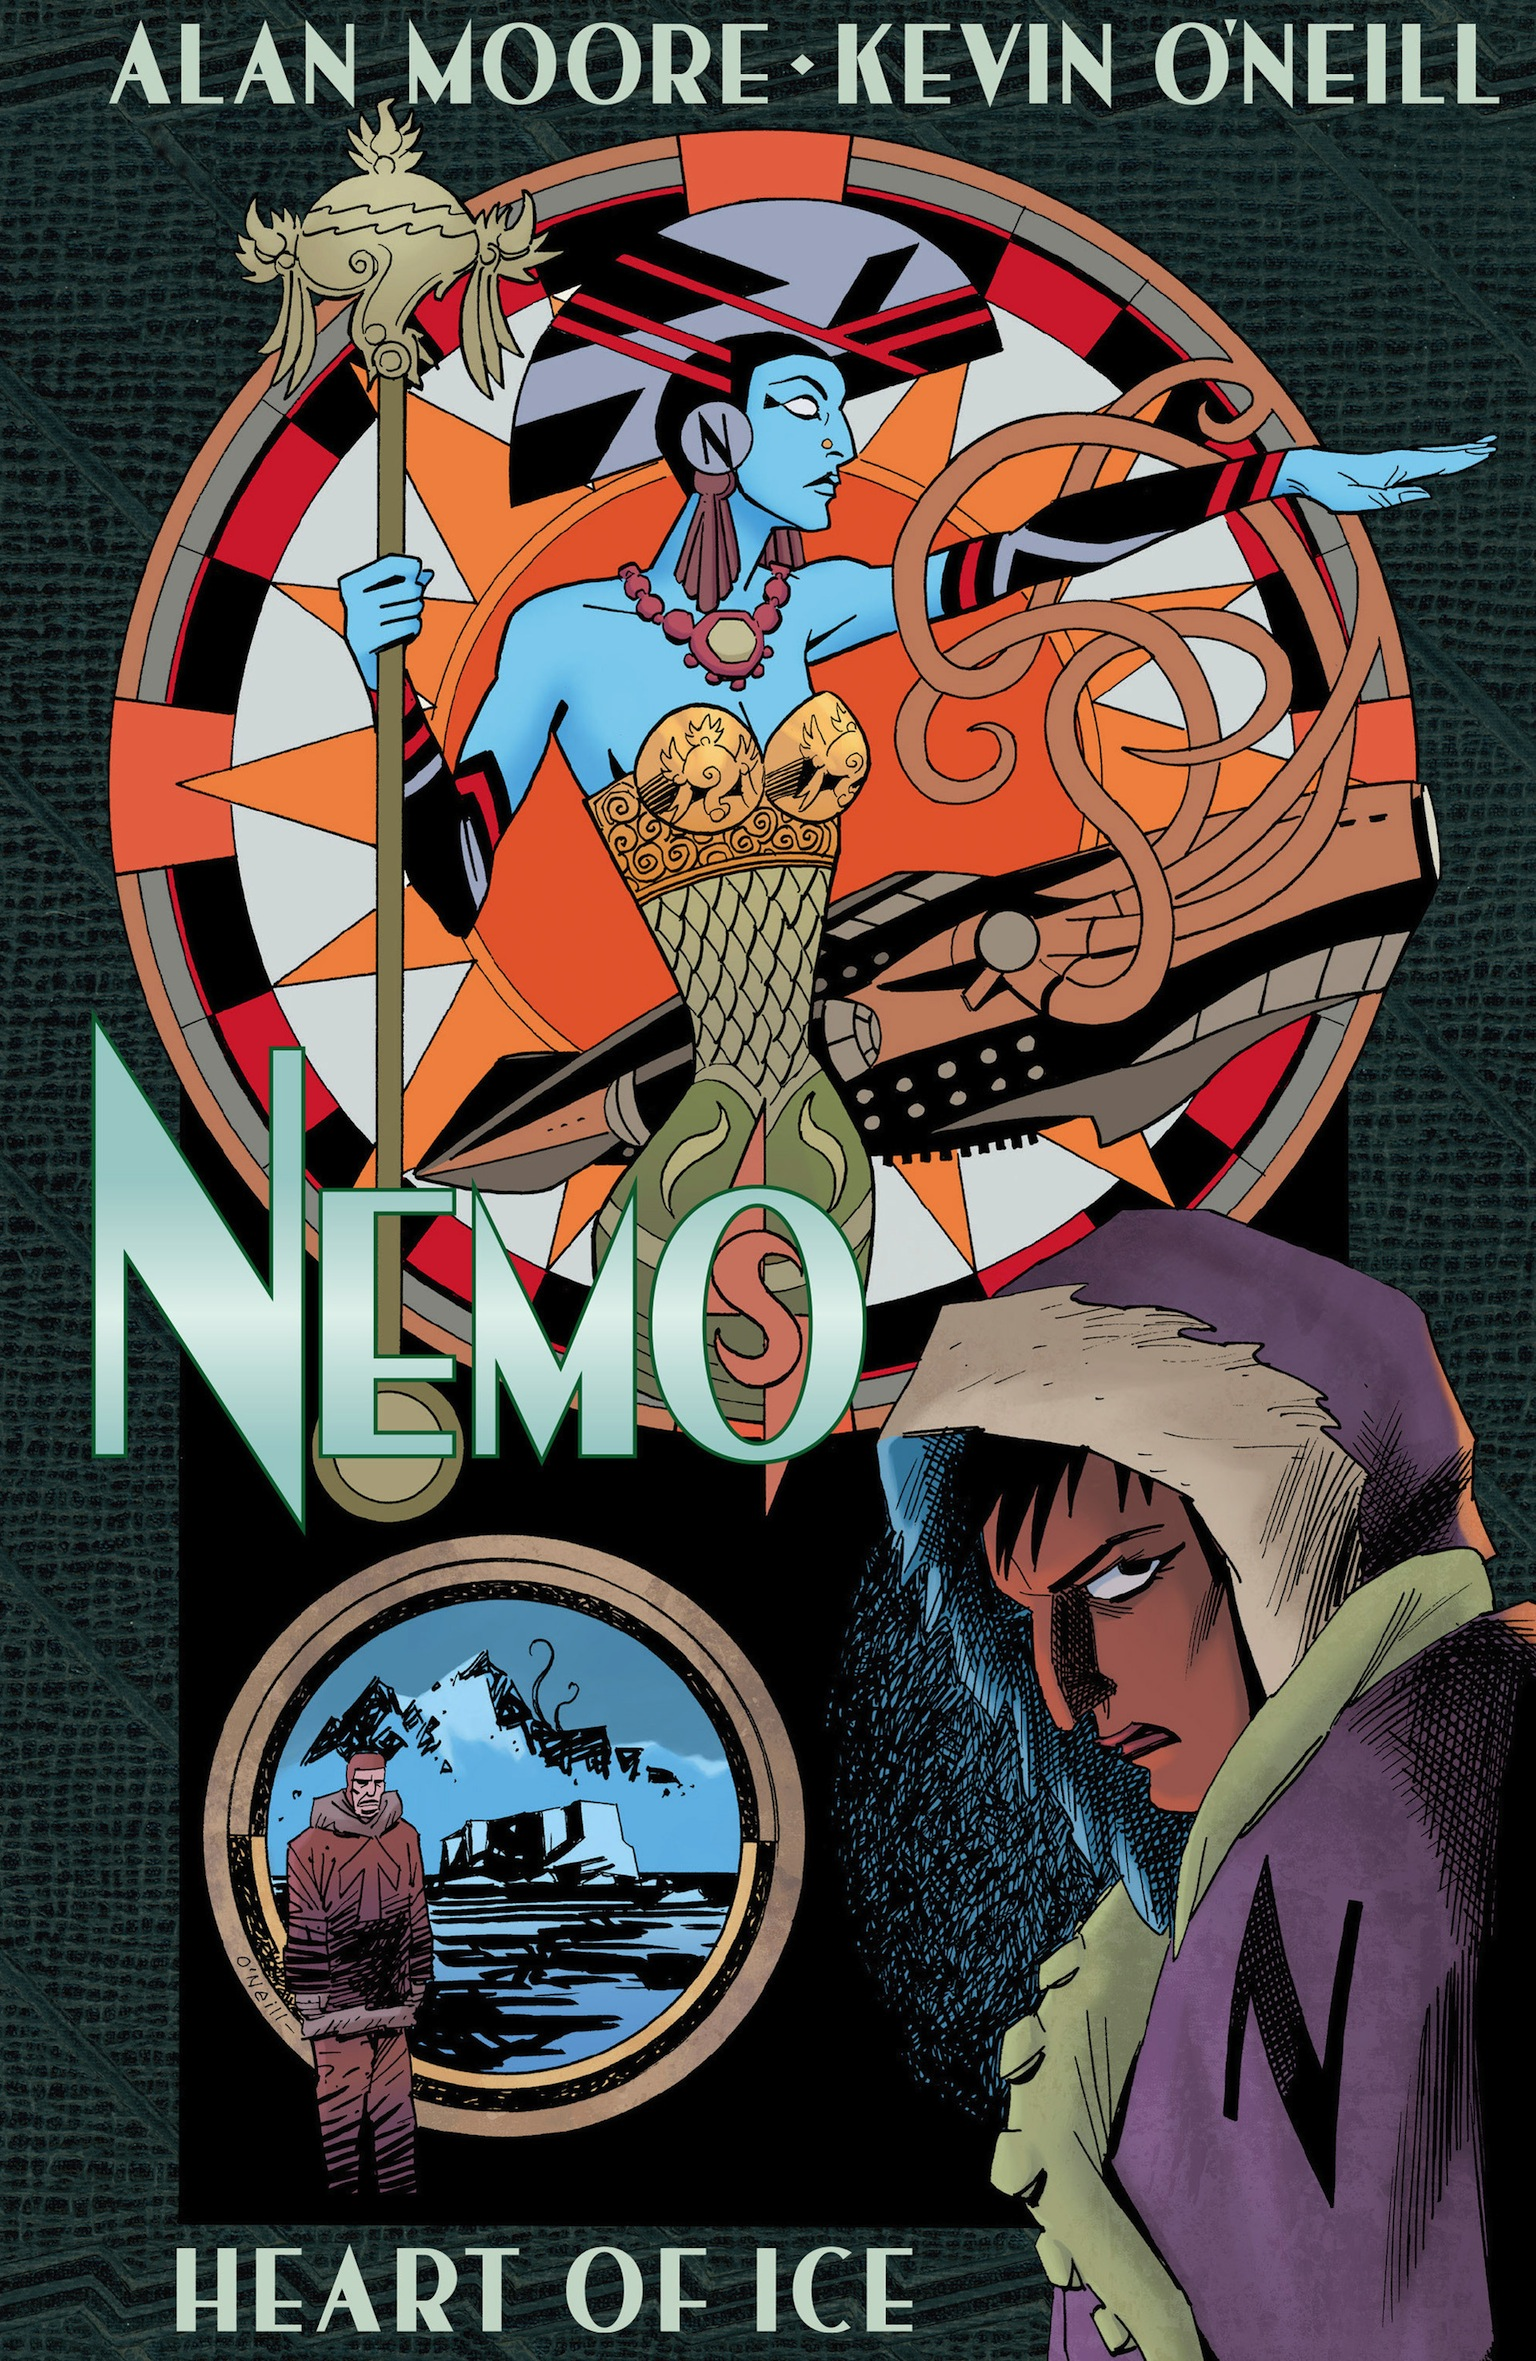 Nemo - Heart of Ice cover